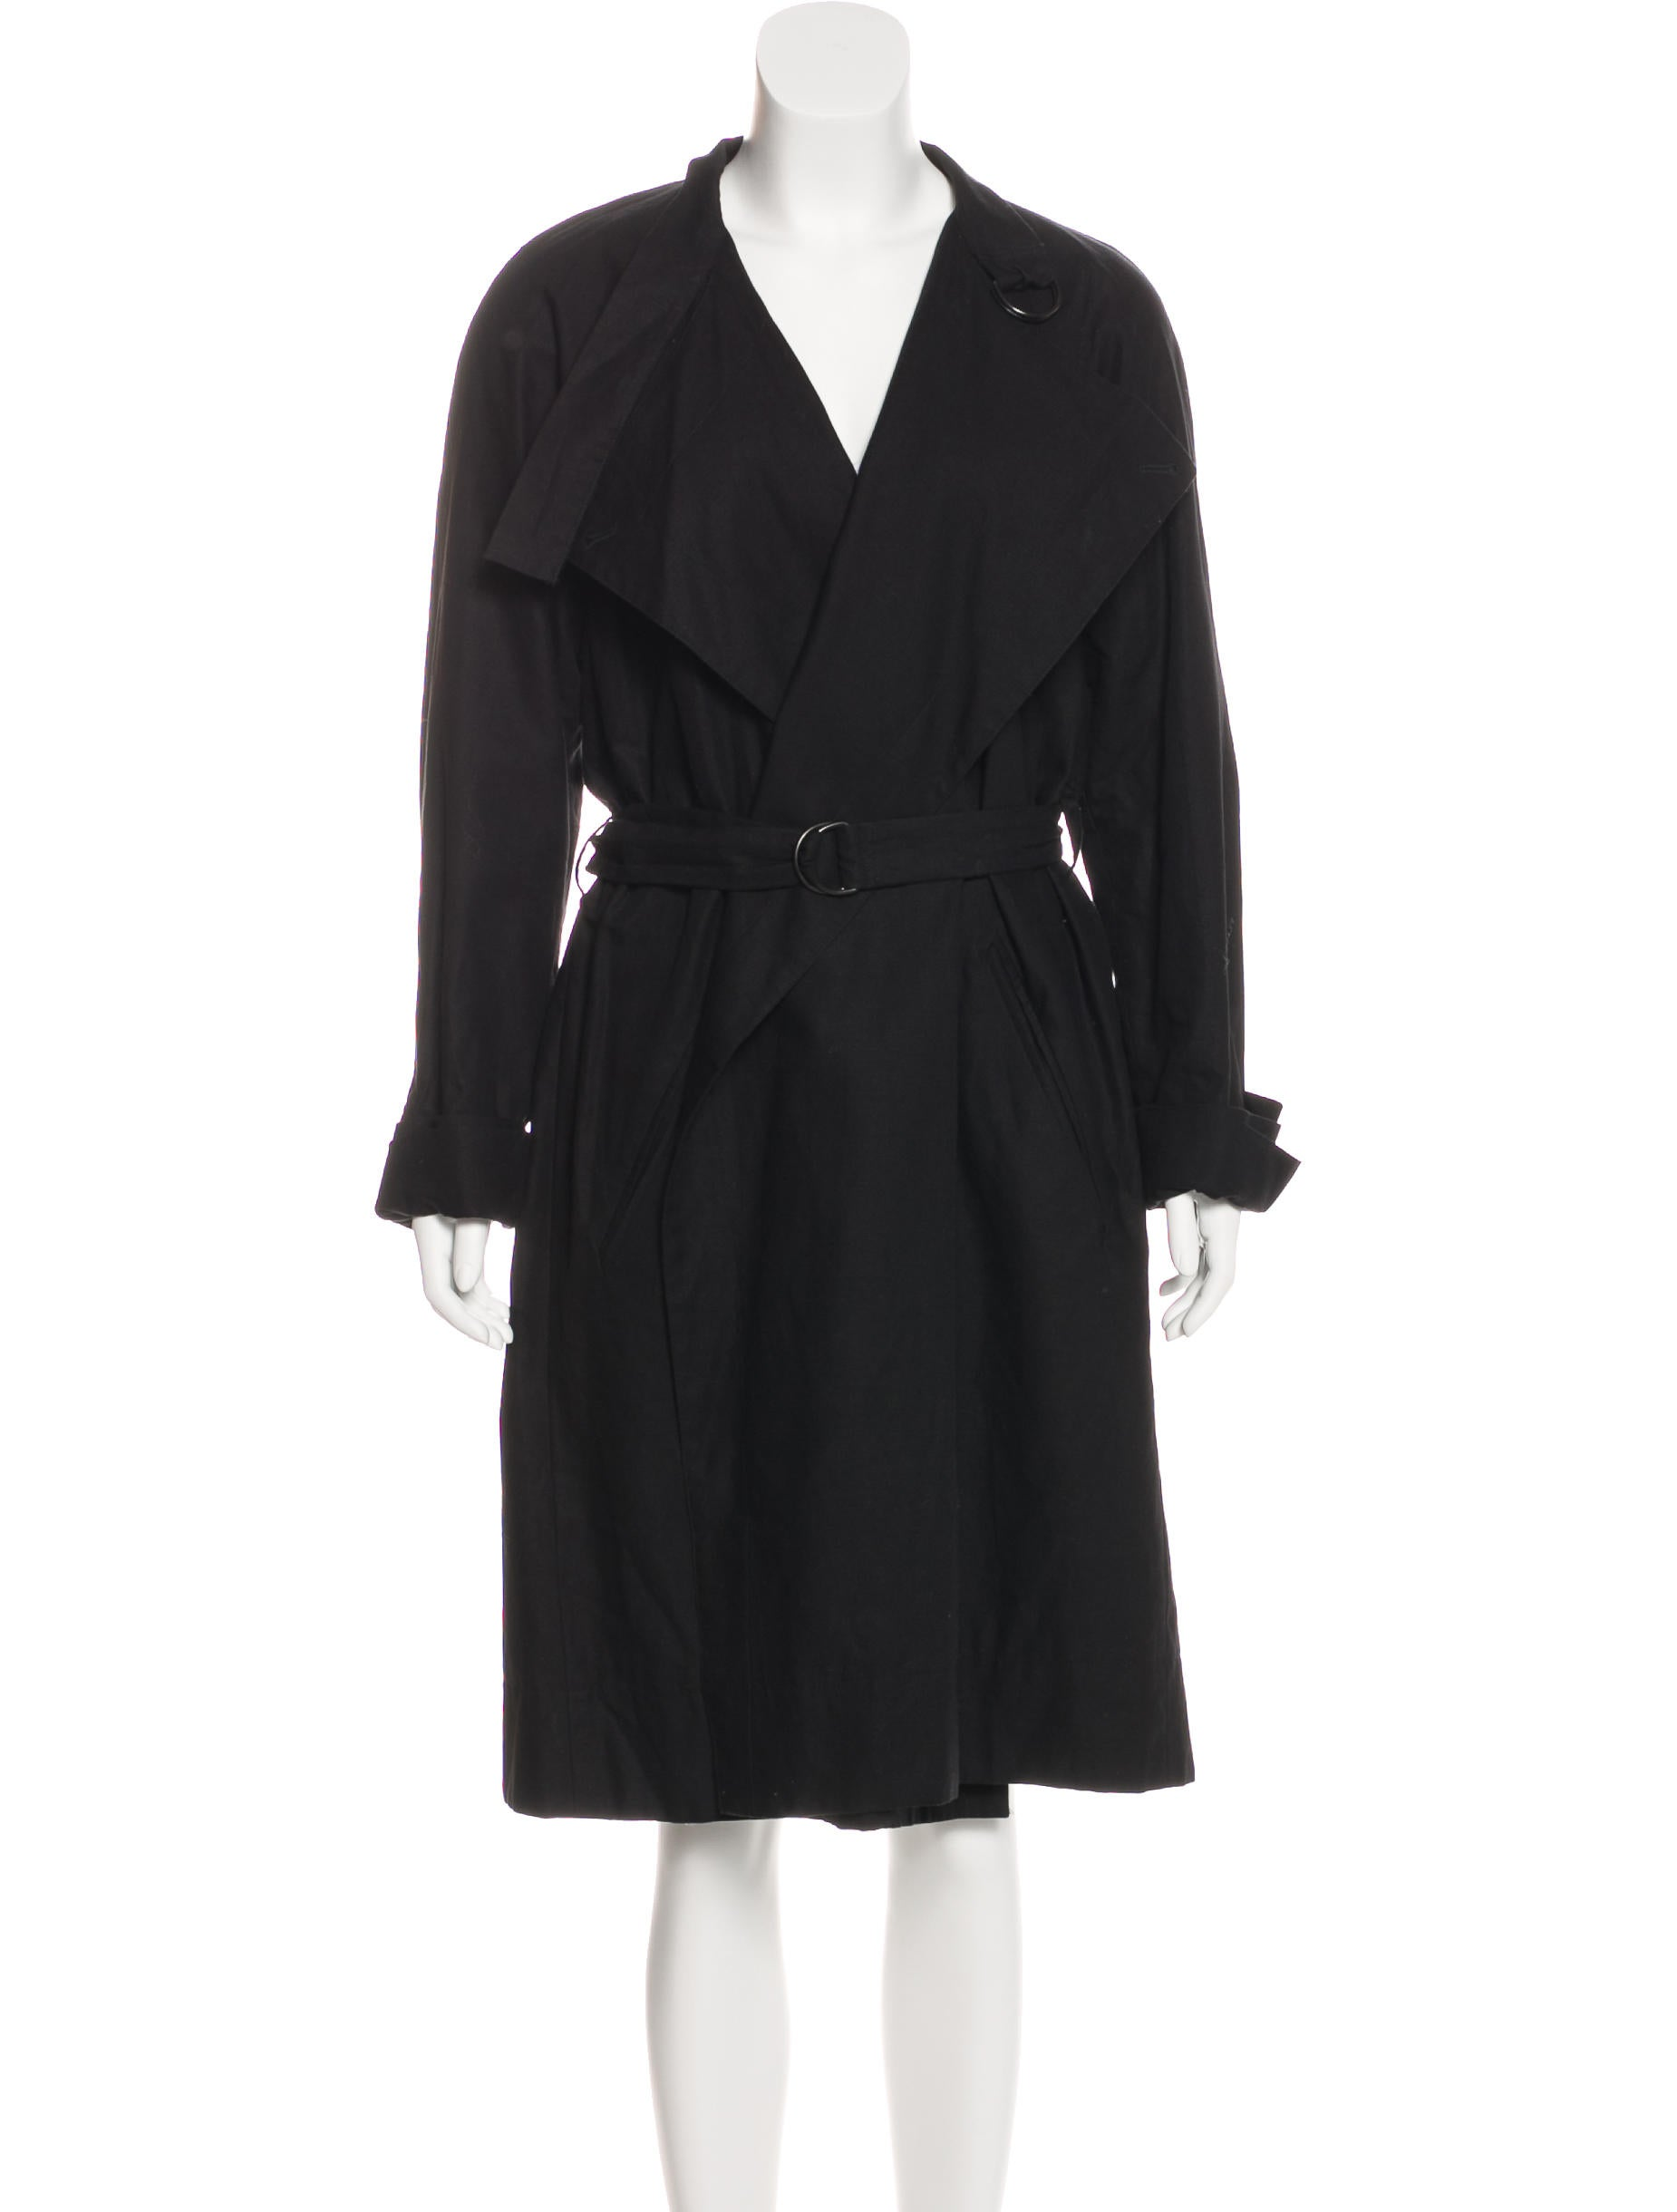 Isabel Marant Long Woven Coat - Clothing - ISA45642 | The RealReal